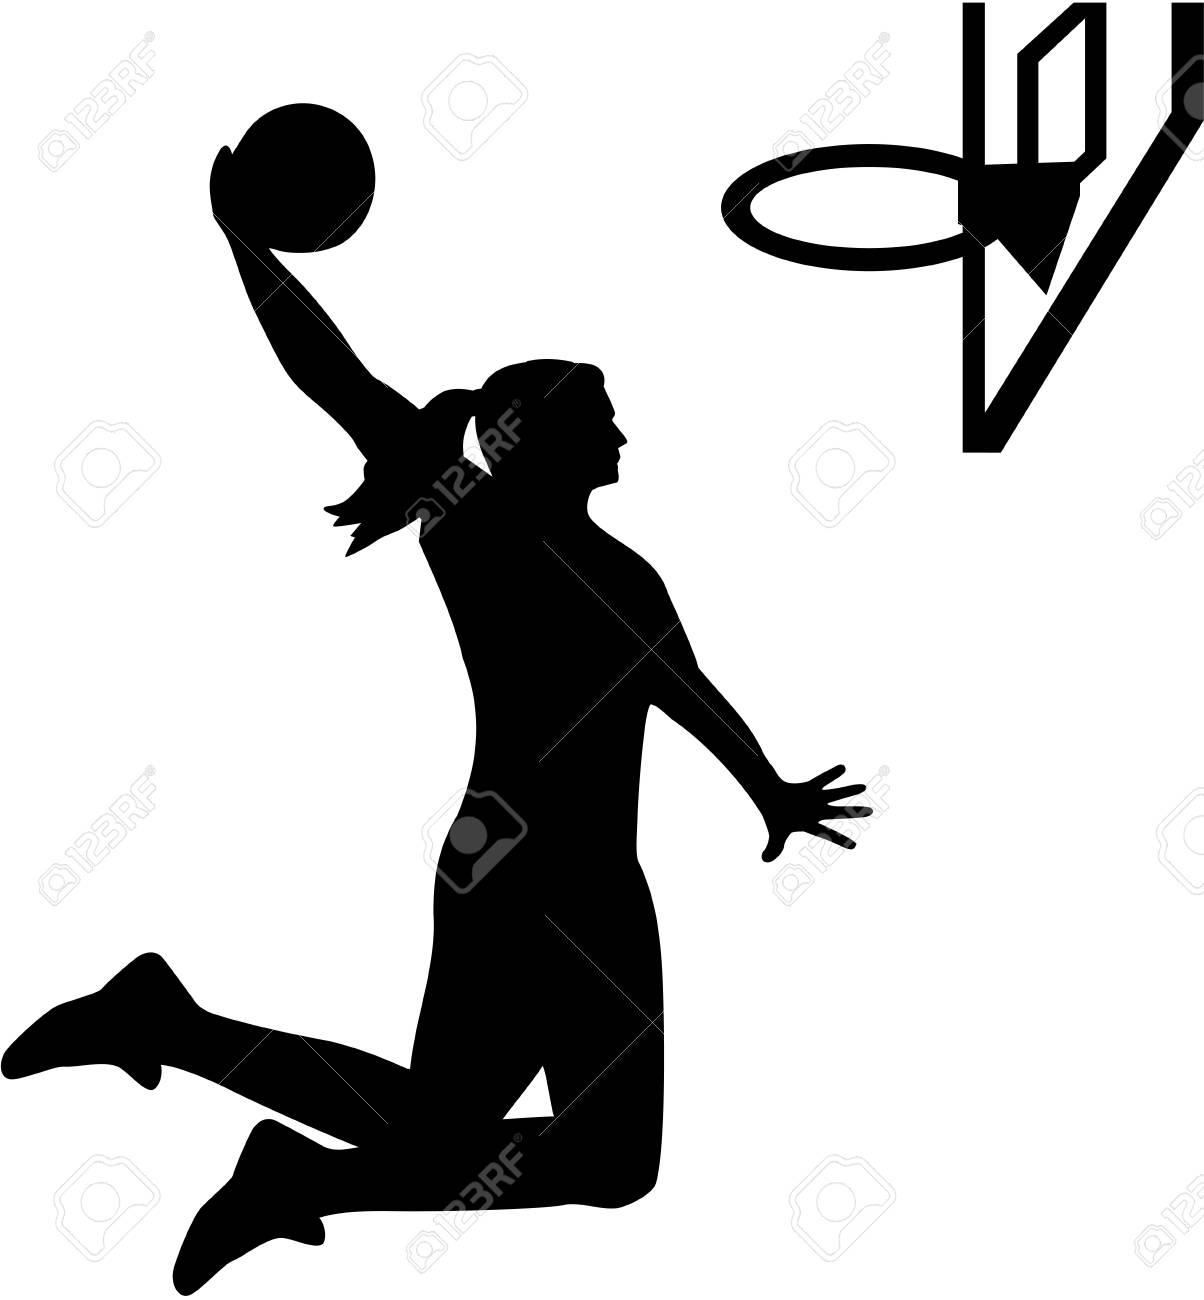 Female Basketball Player - 67504261